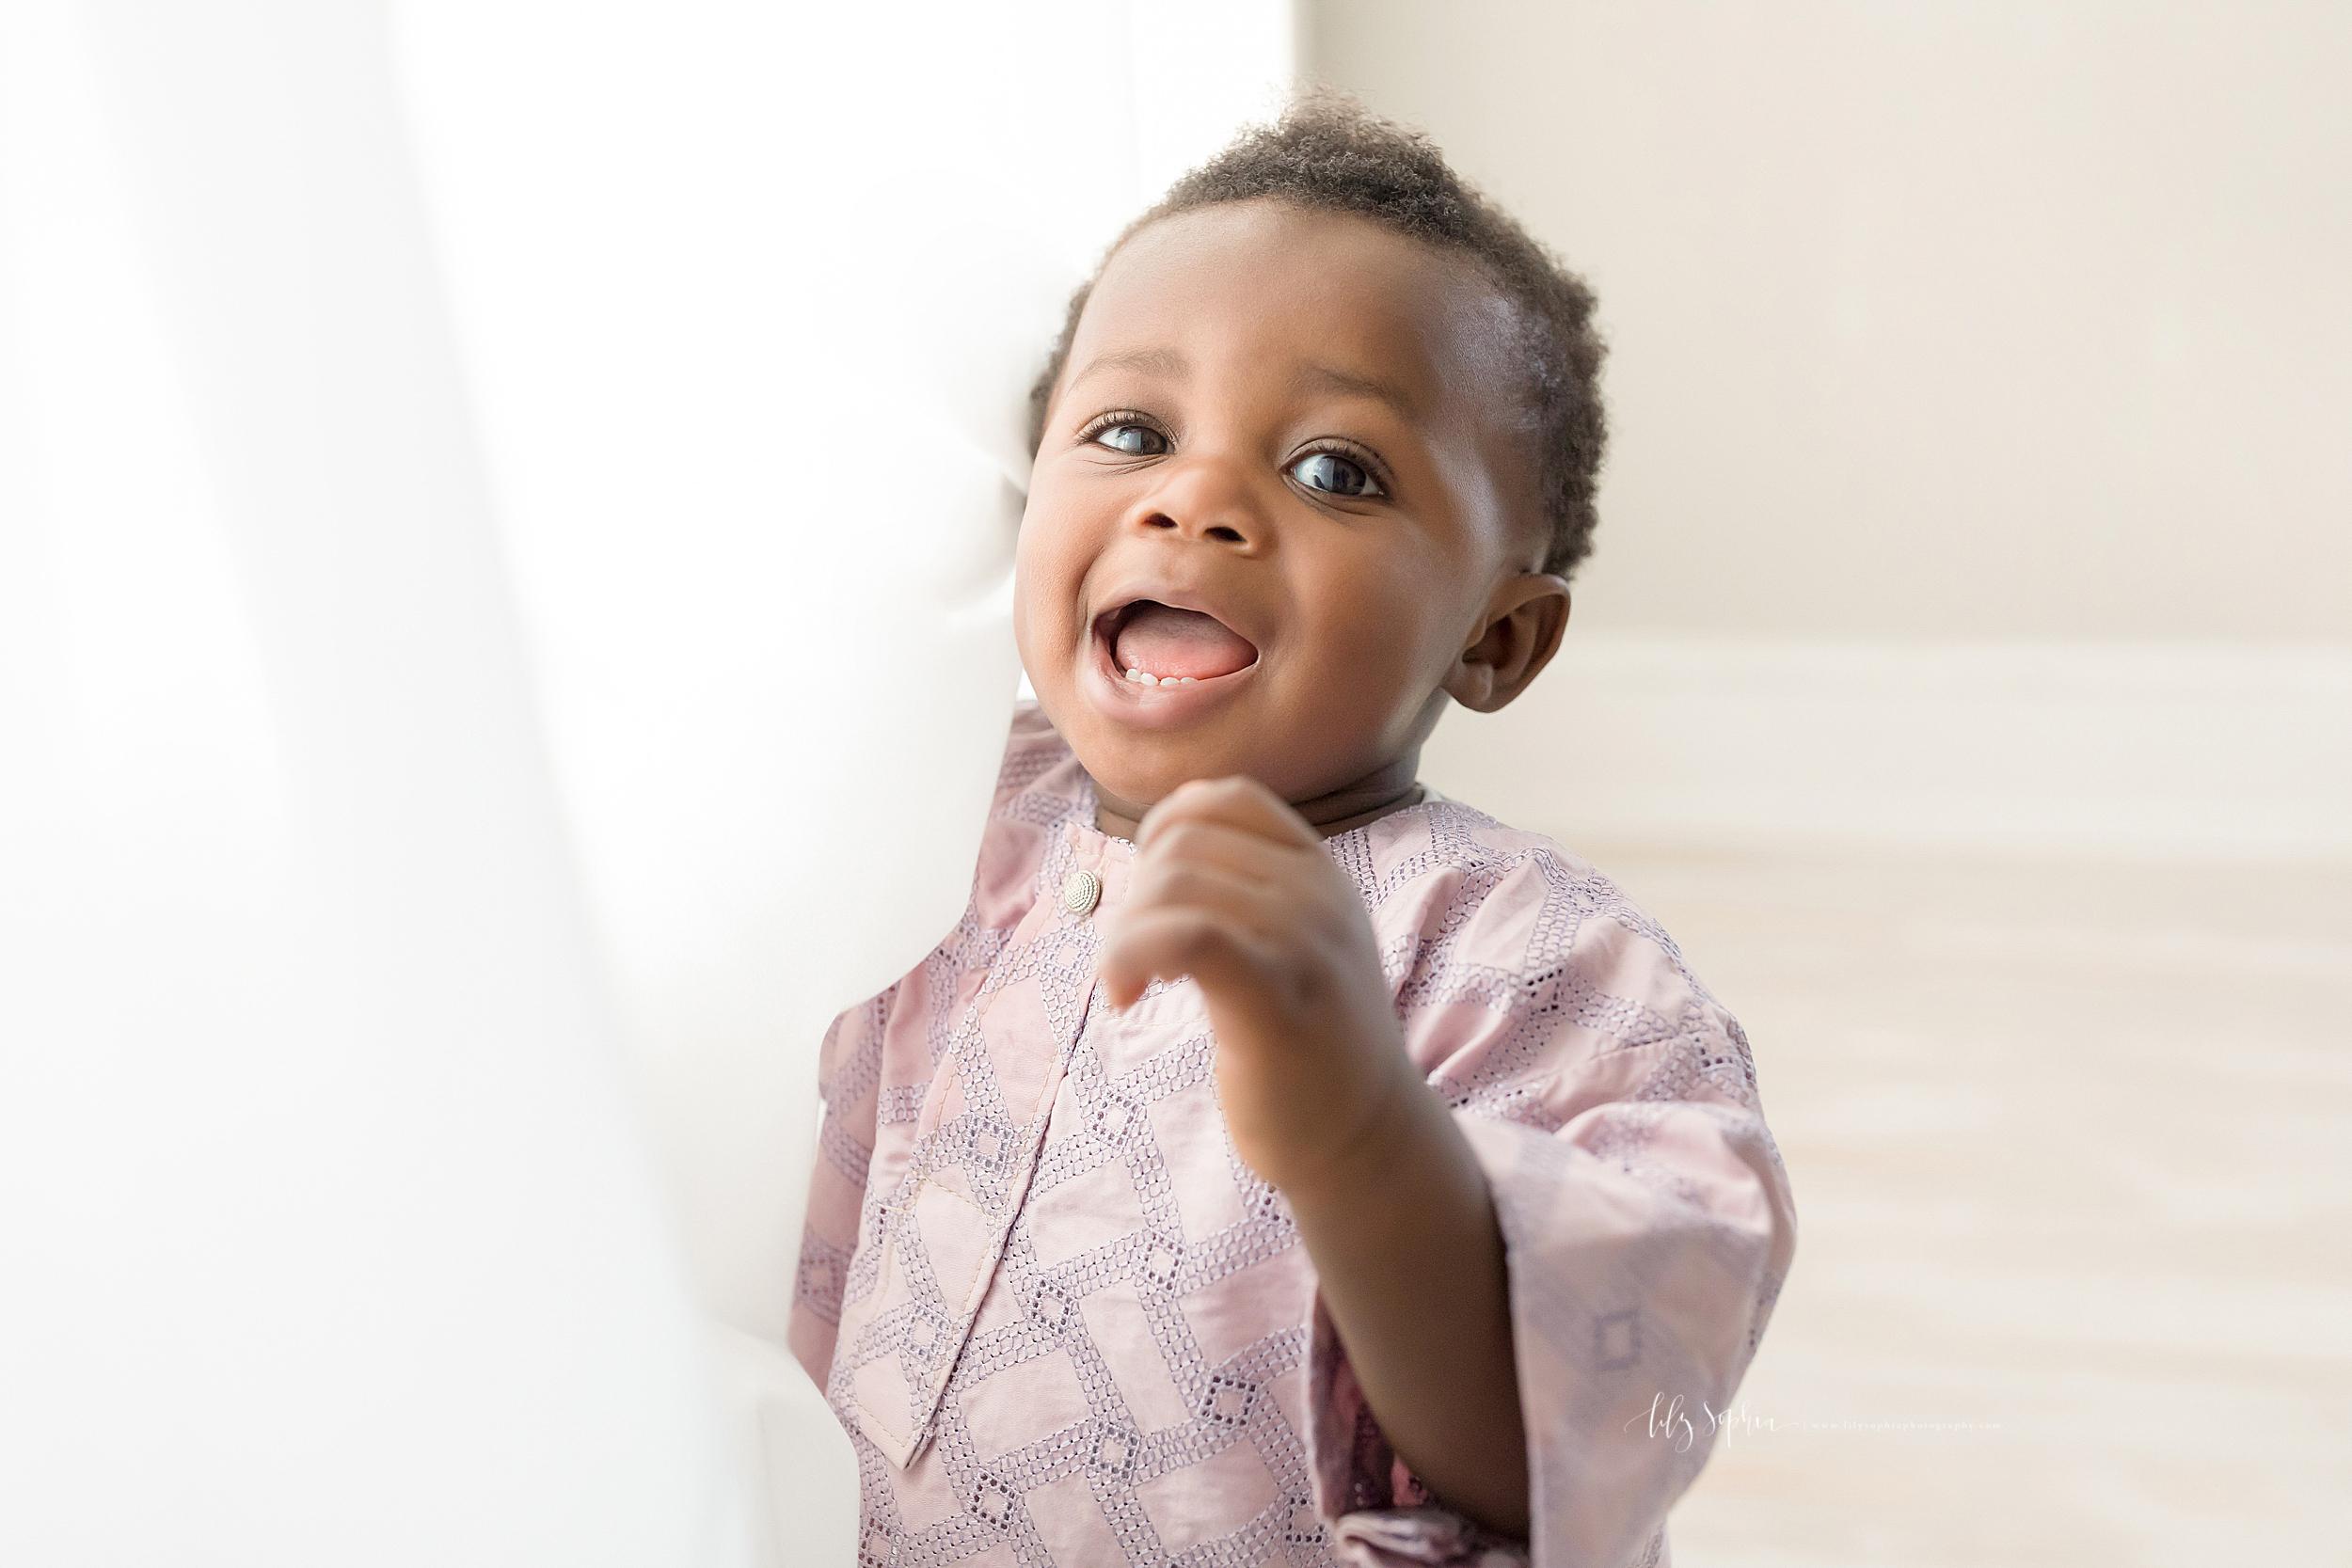 atlanta-midtown-brookhaven-ashford-dunwoody-decatur-lily-sophia-photography-nigerian-family-photographer-first-birthday-toddler-baby-boy-smash-cake-studio-photos_0390.jpg